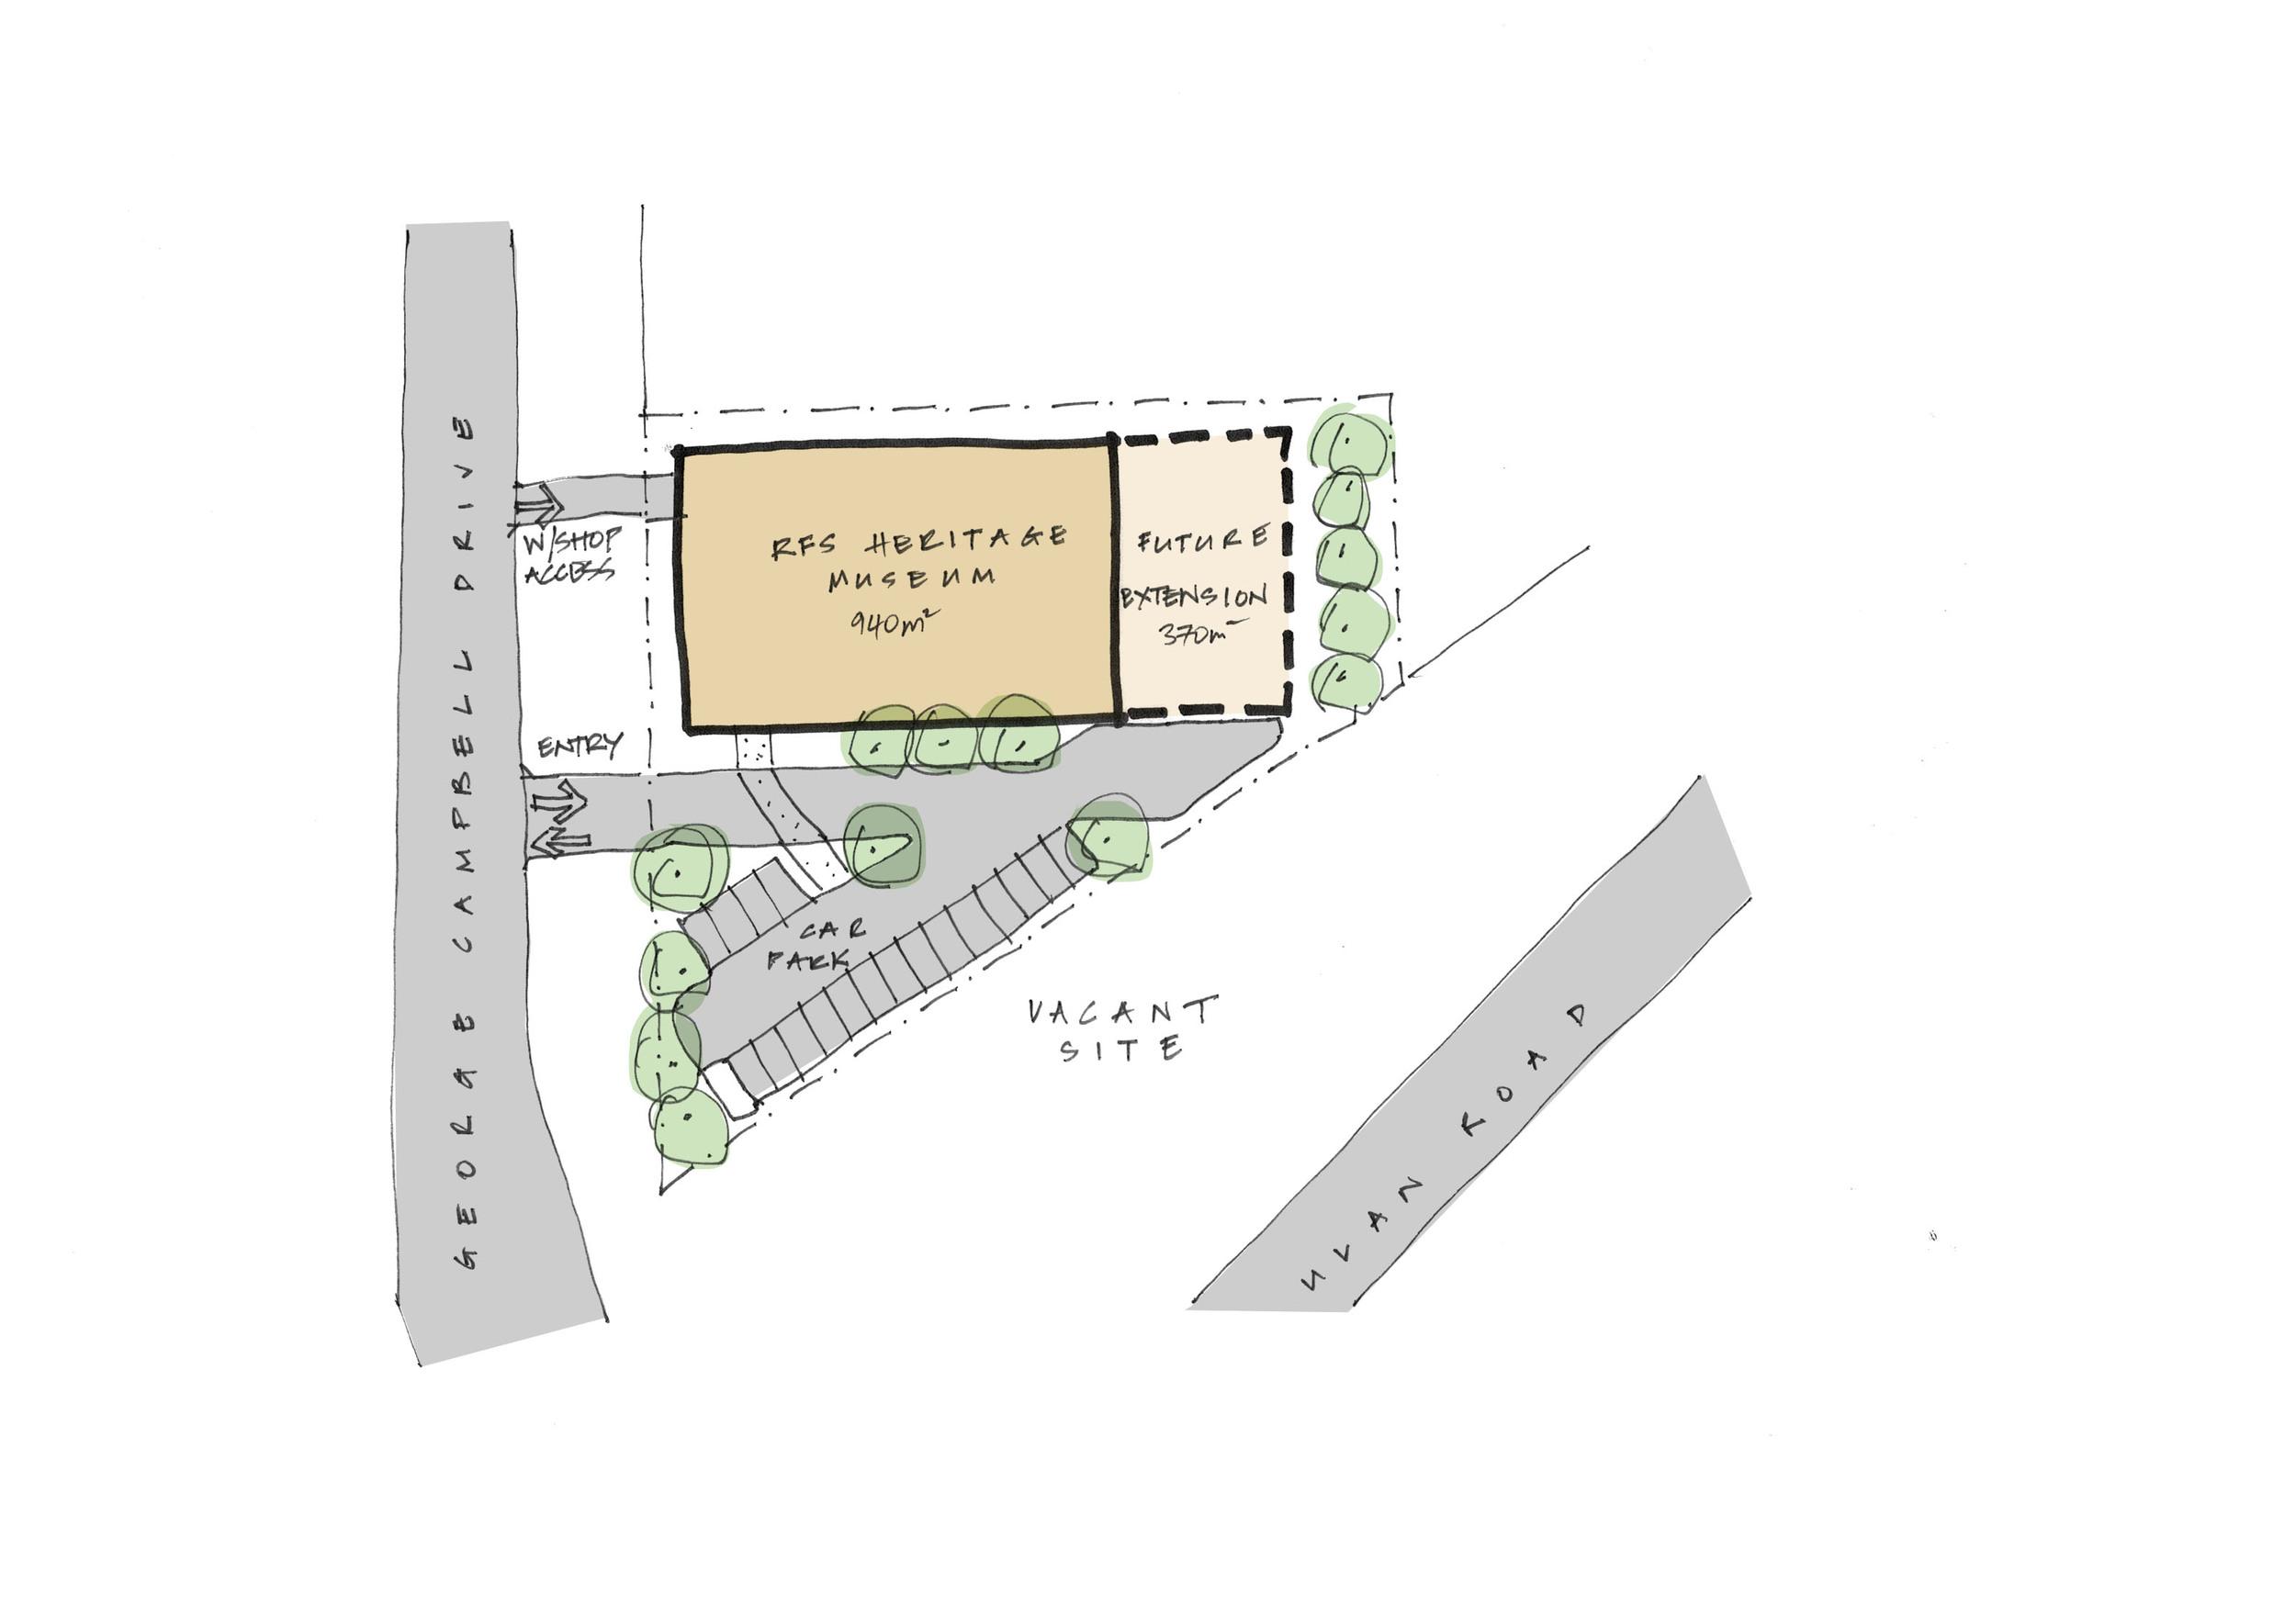 W_096_Sketch Site Plan.jpg